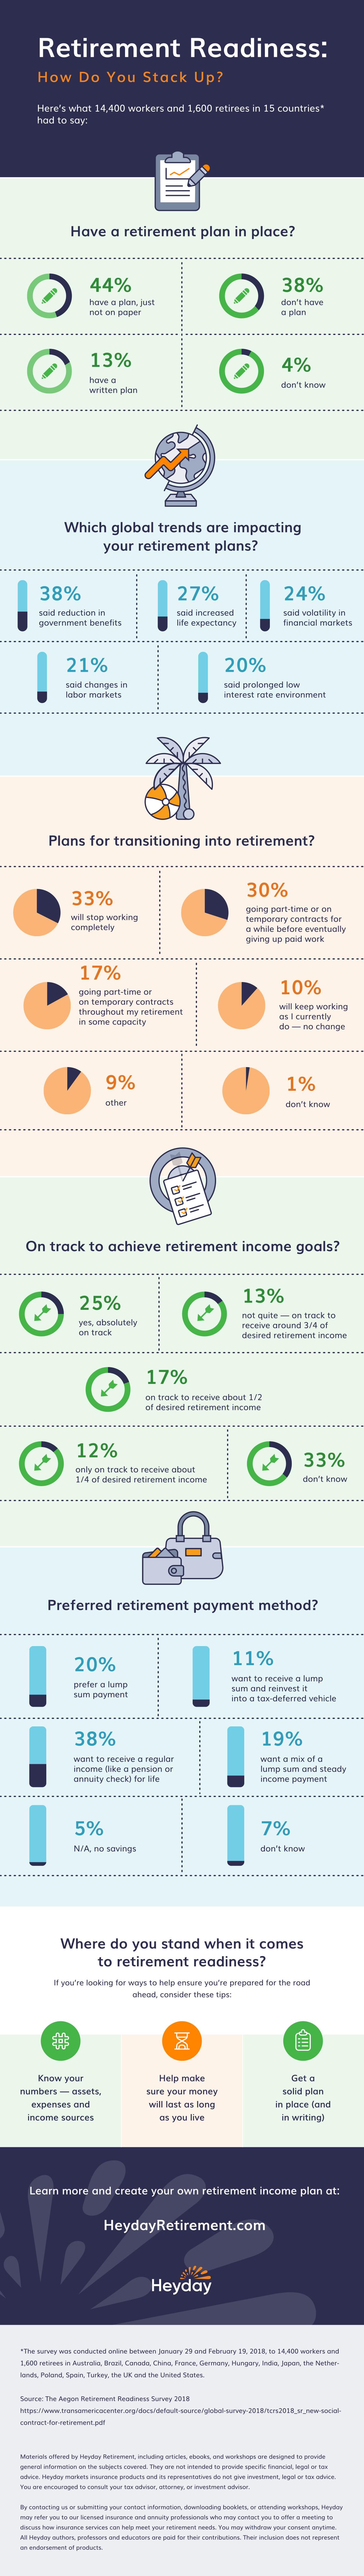 Heyday Retirement Readiness Infographic_